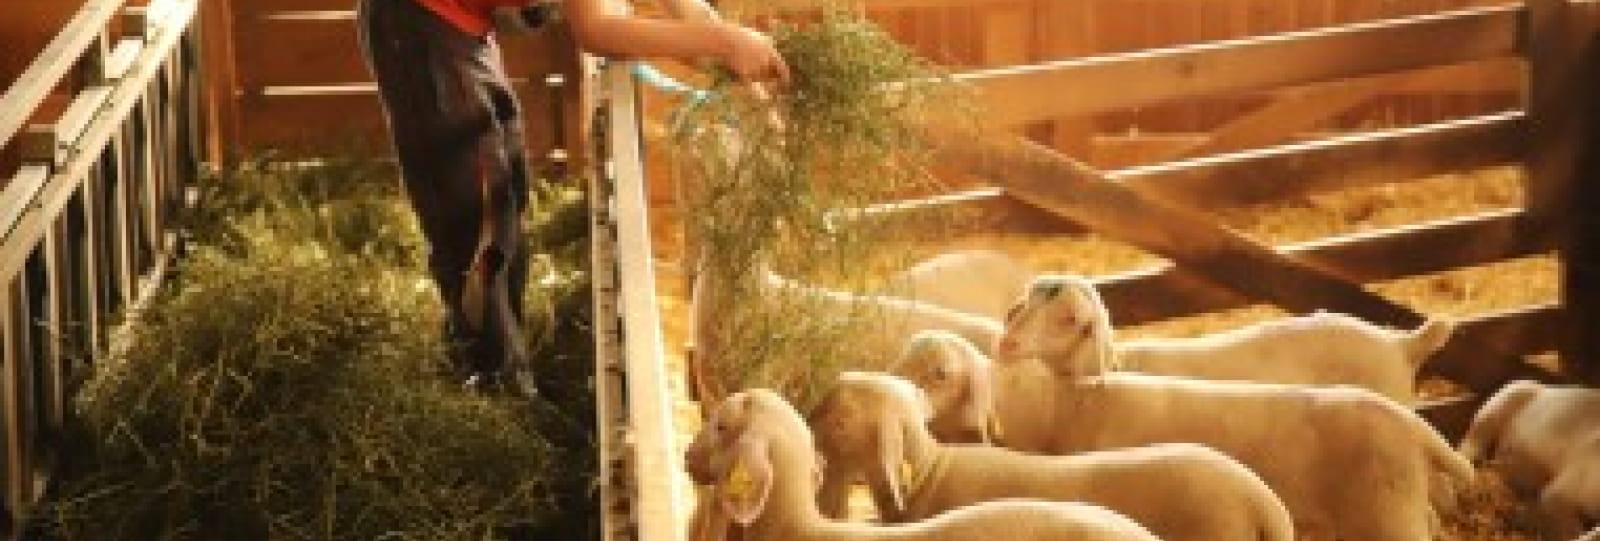 Dessine-moi une brebis: visite de la ferme